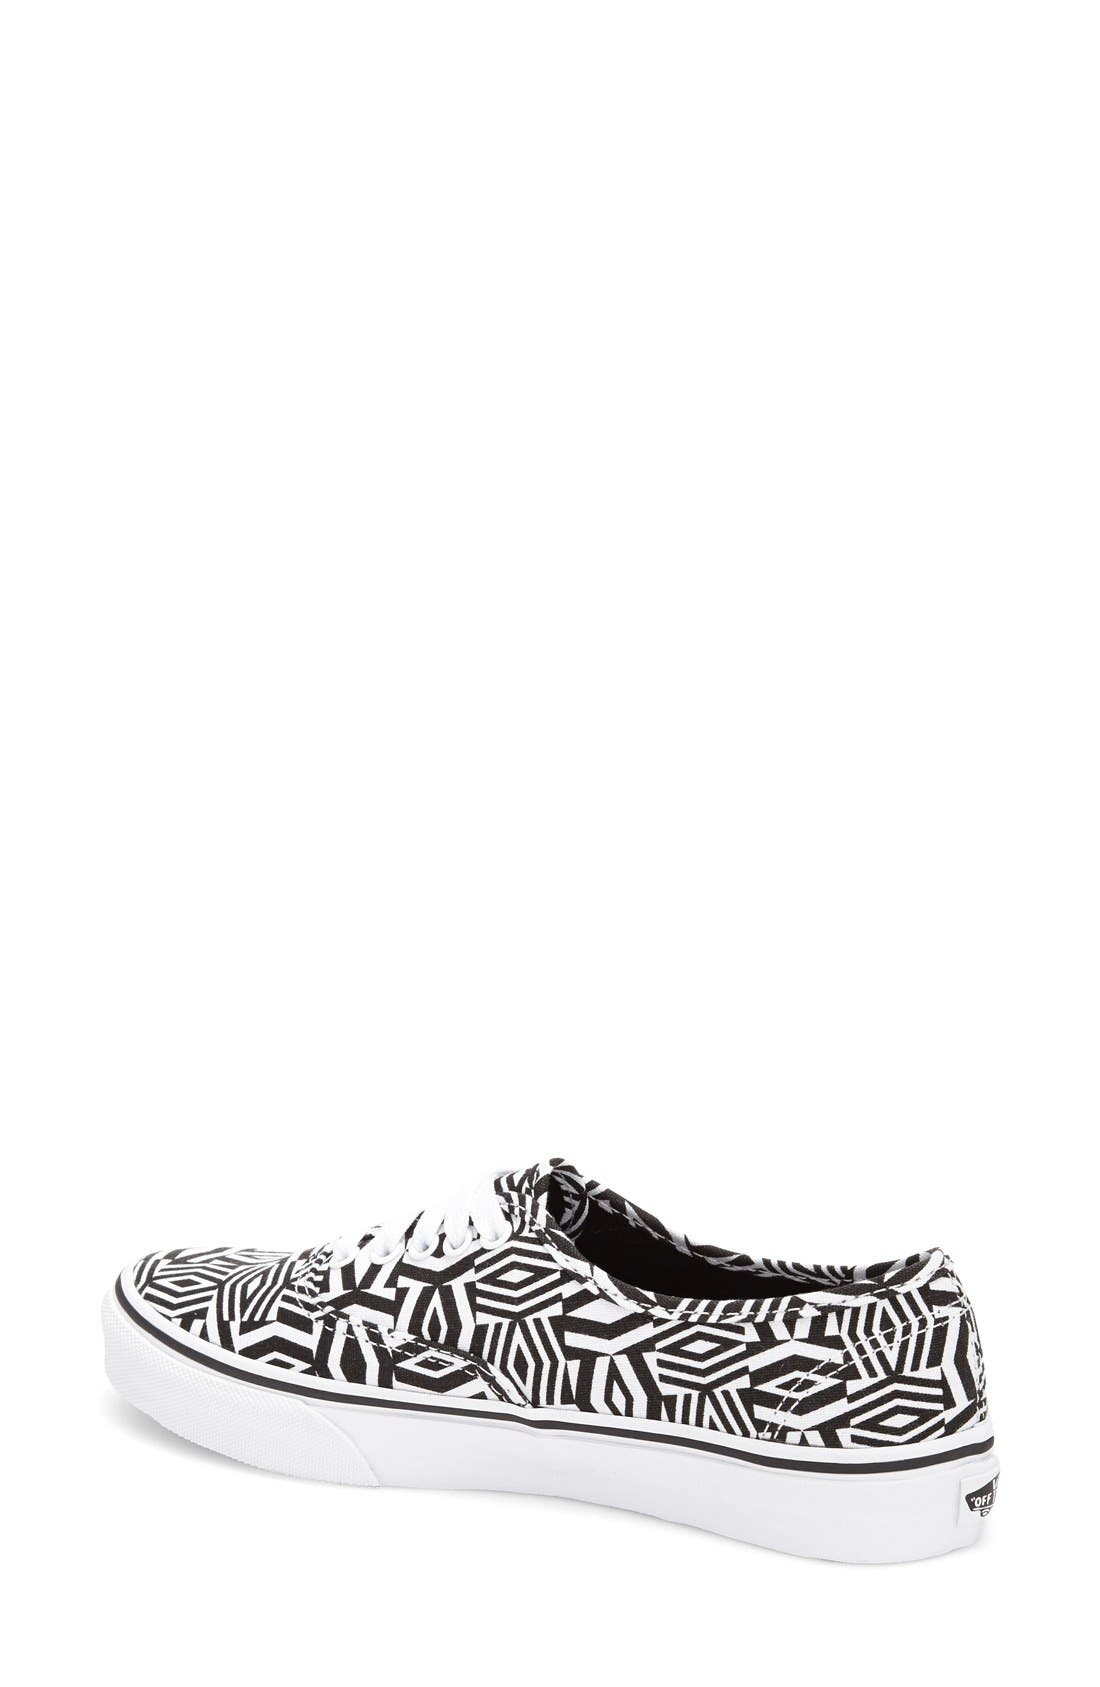 Alternate Image 2  - Vans 'Authentic Slim - Geo Realm' Sneaker (Women)